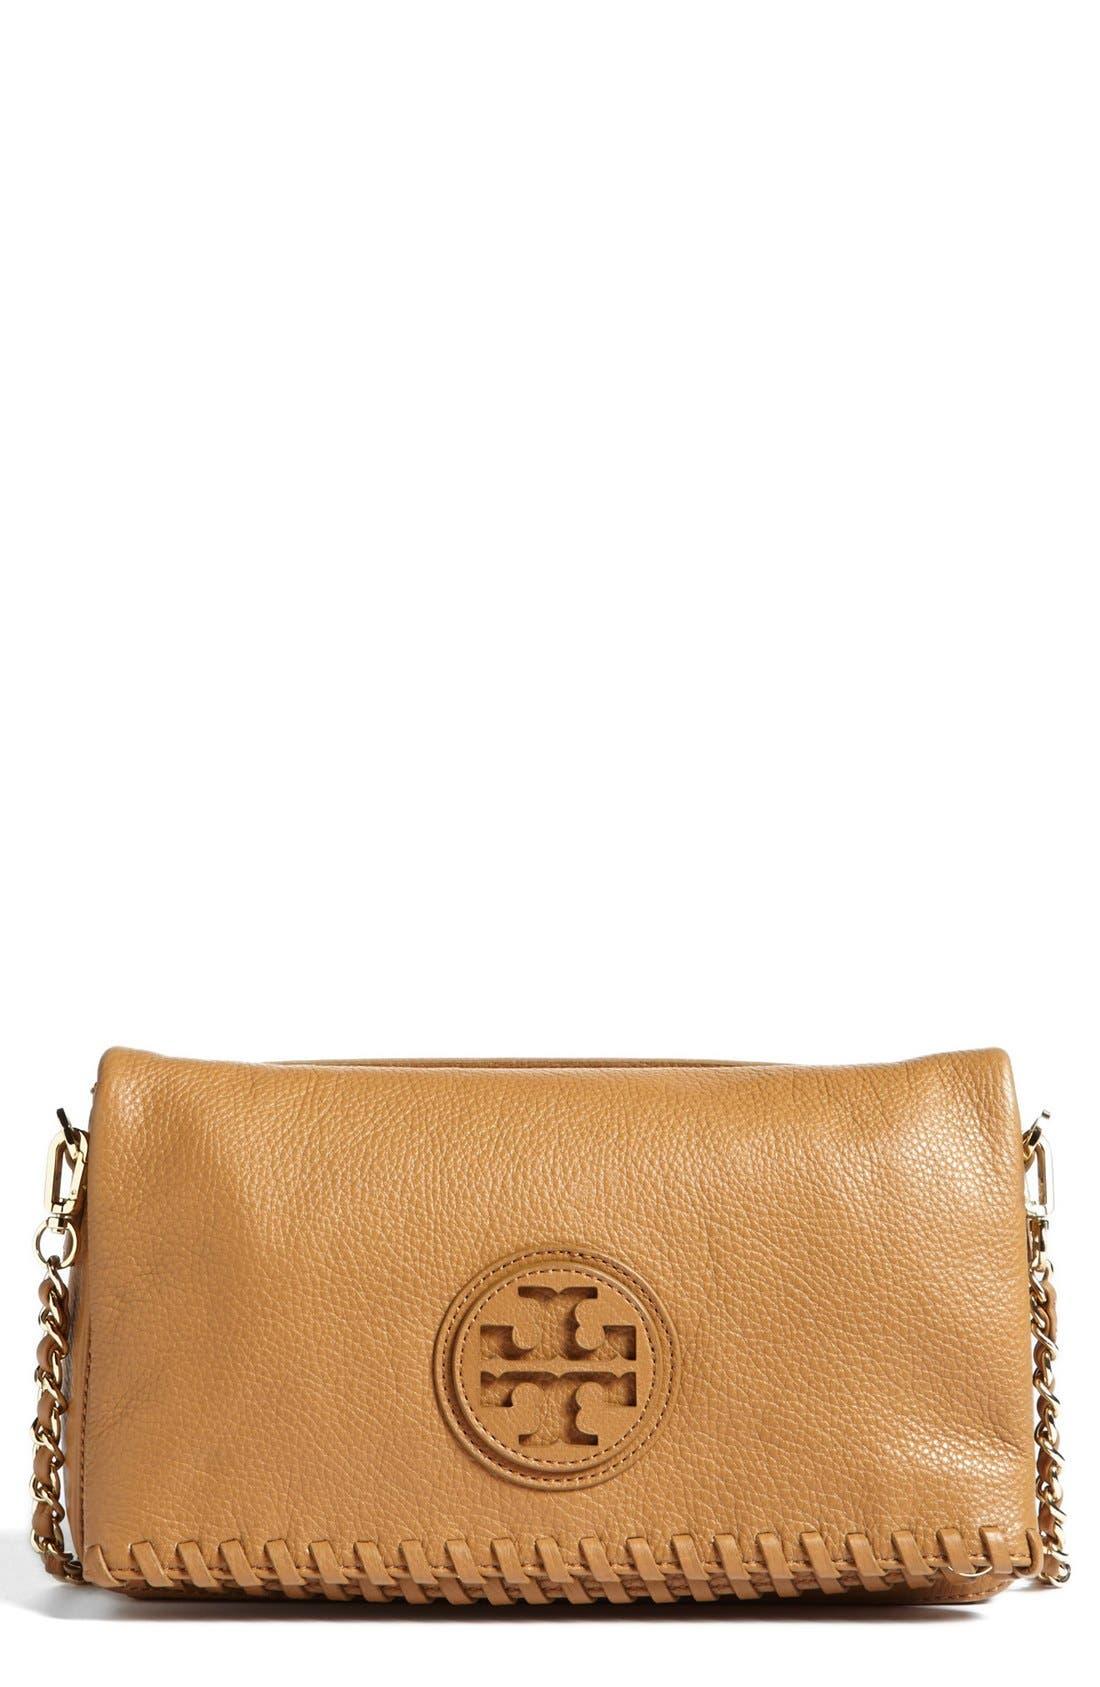 Alternate Image 1 Selected - Tory Burch 'Marion' Foldover Crossbody Bag